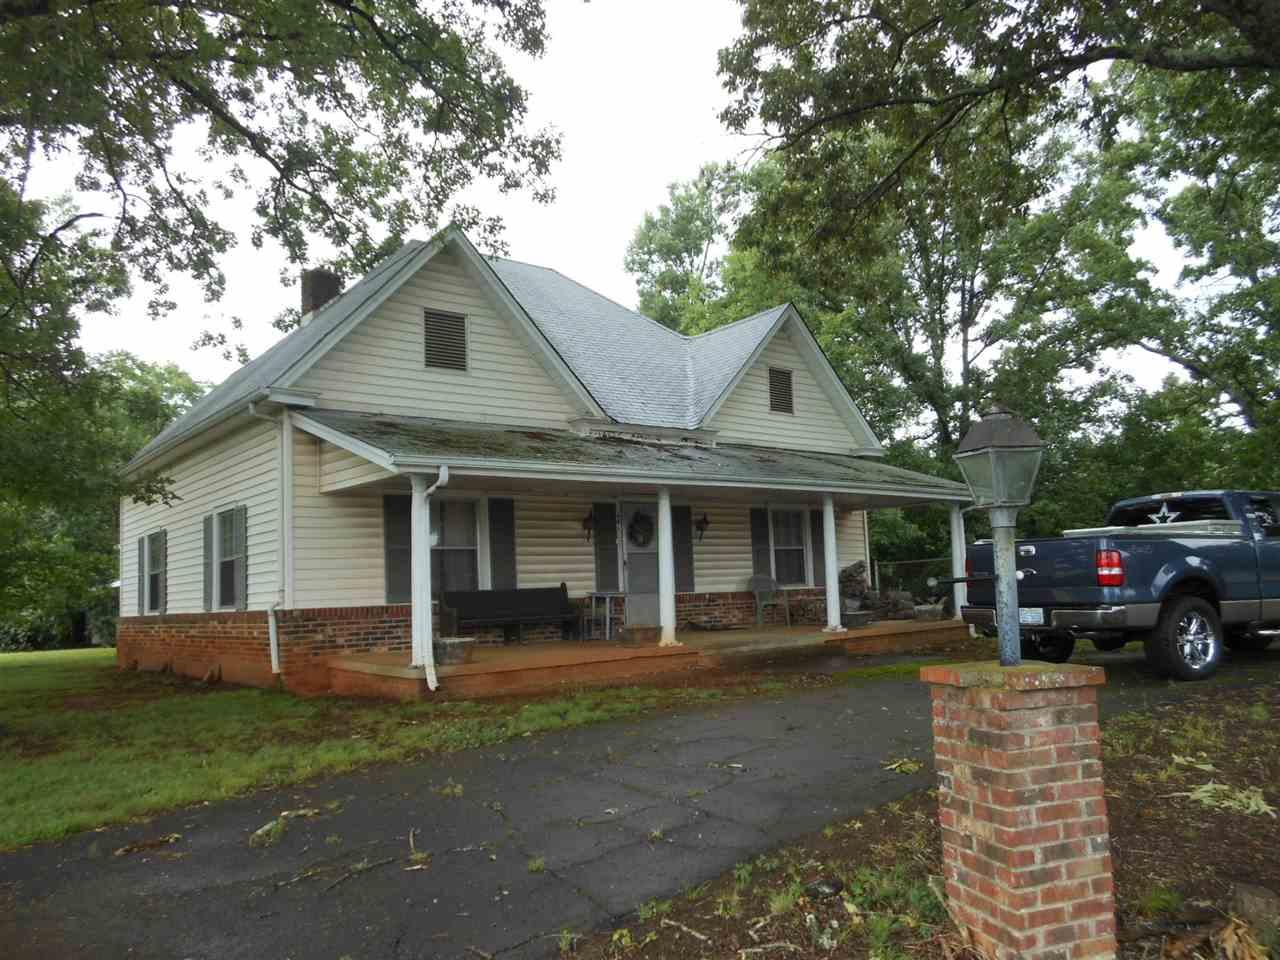 481 Vance Street, Forest City, NC 28043